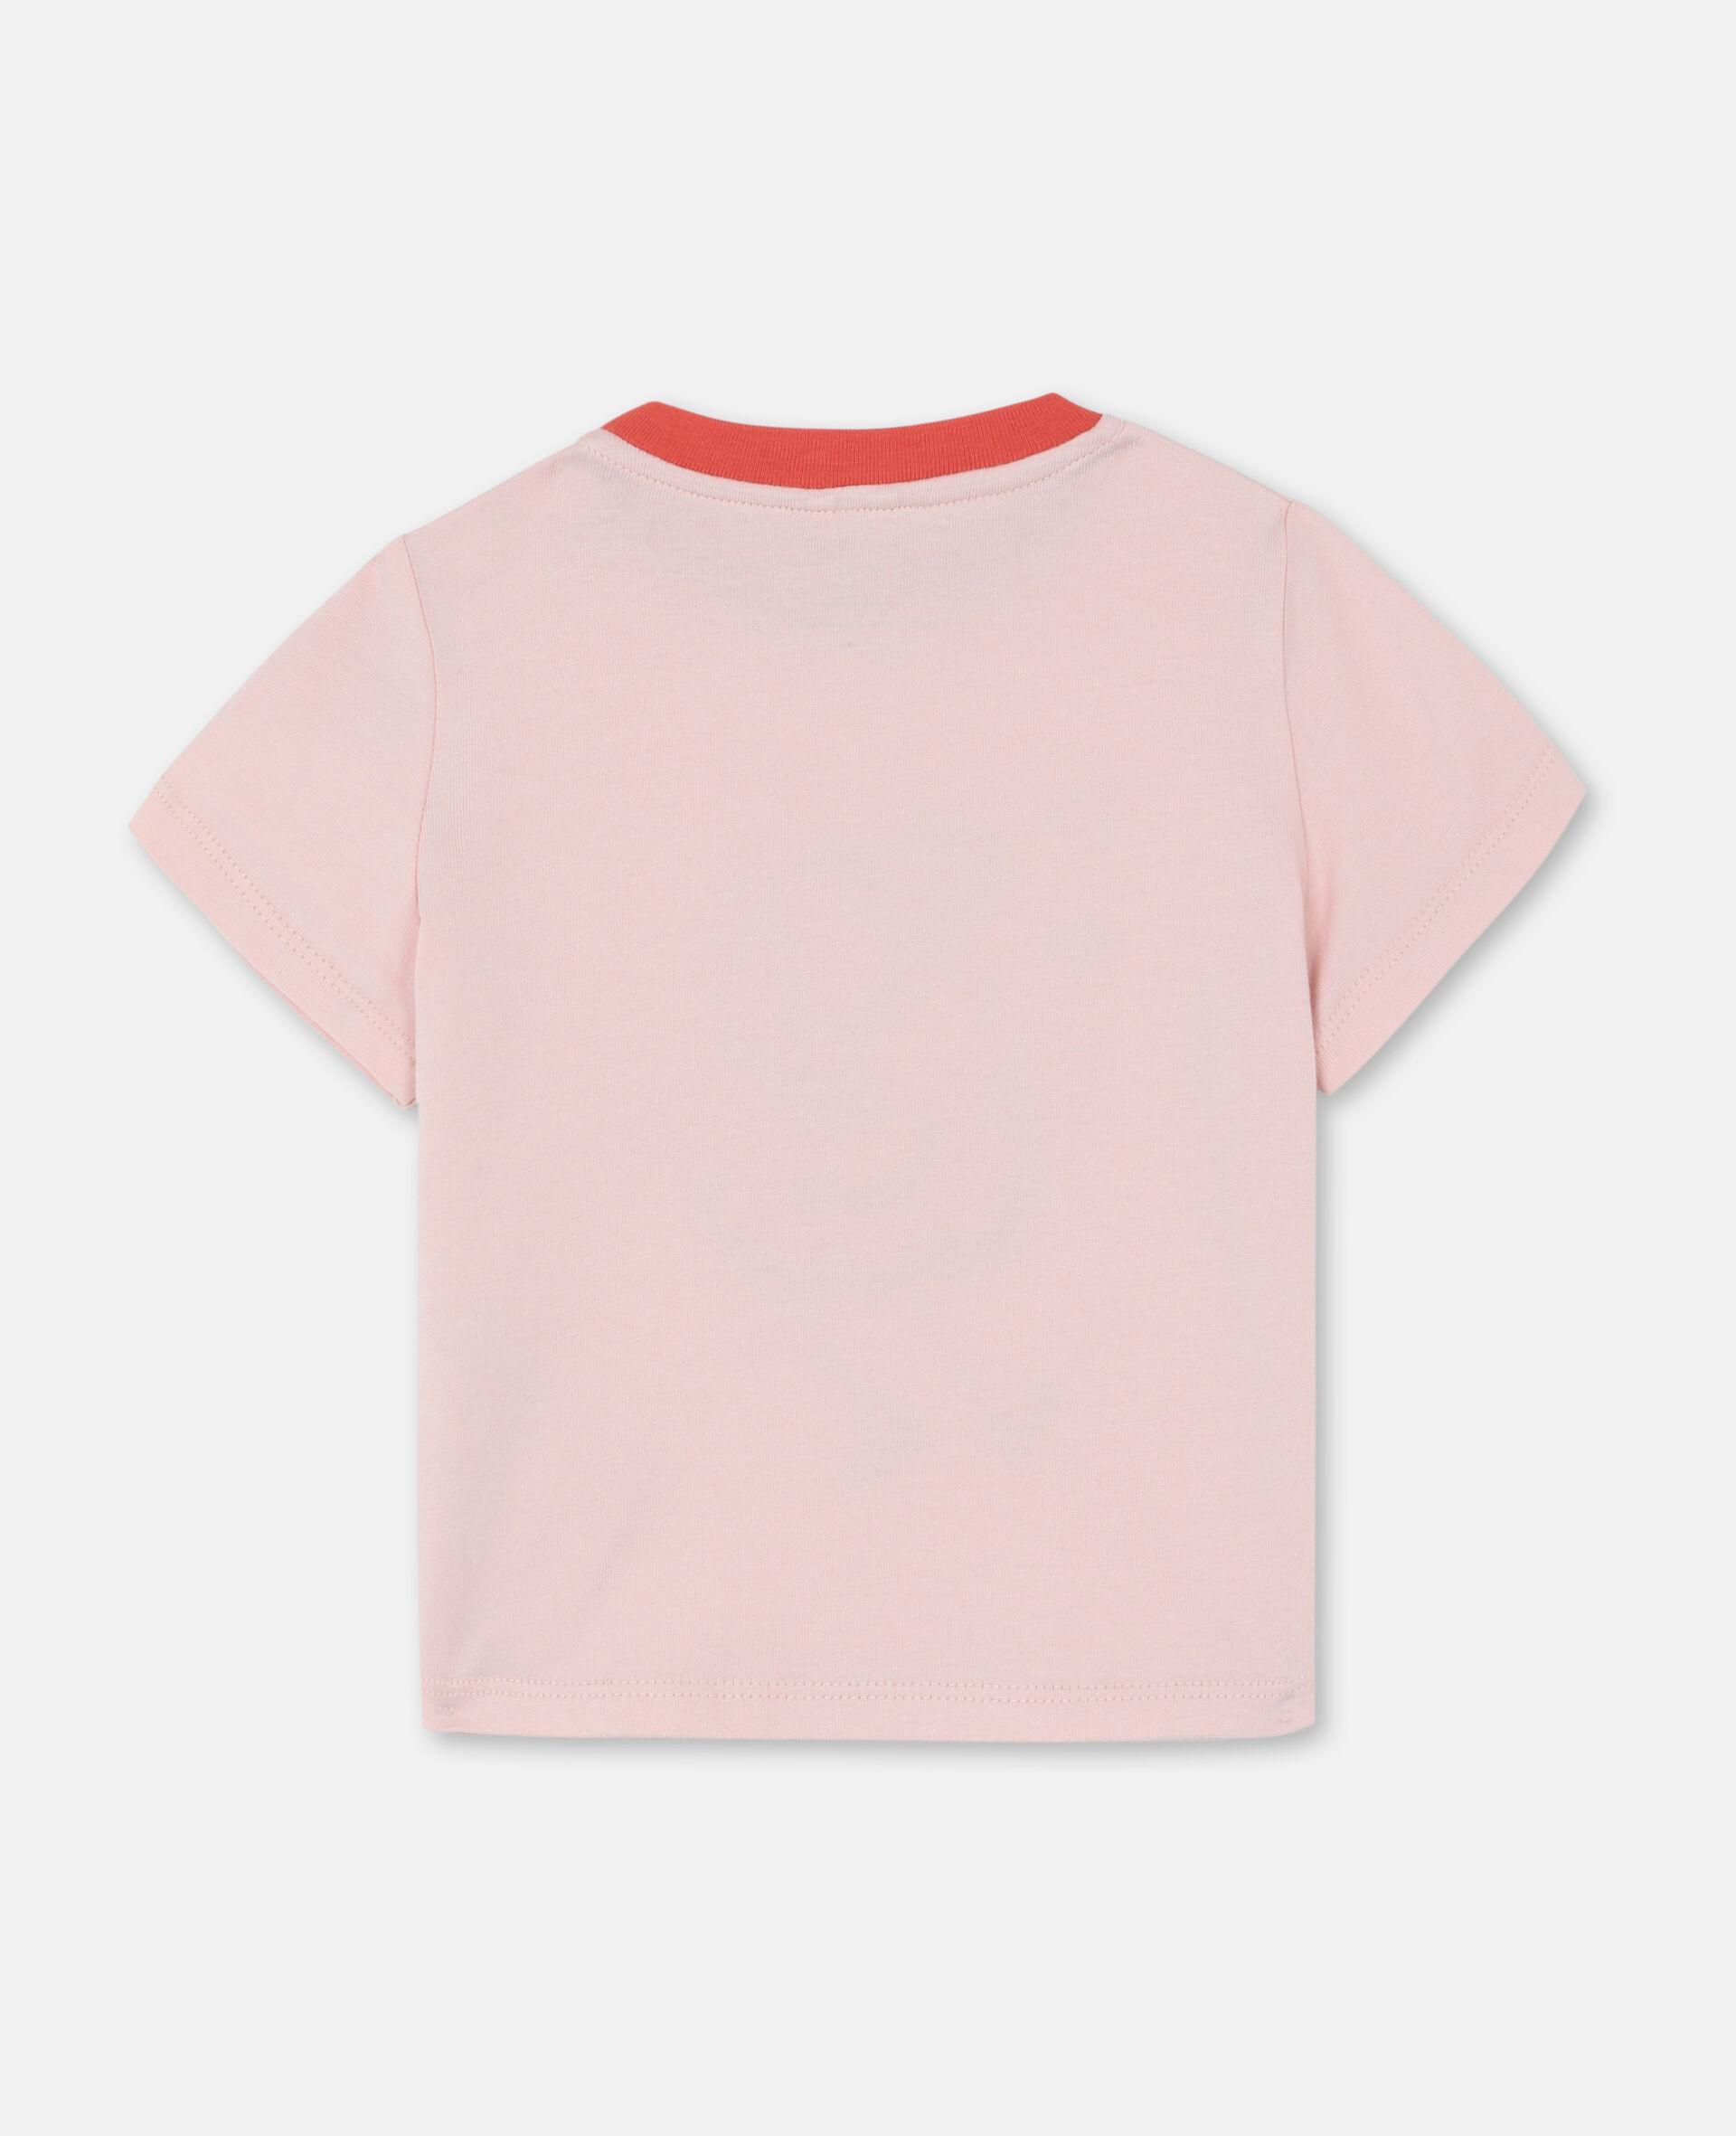 Dancing Flamingo Cotton T-shirt-Pink-large image number 3